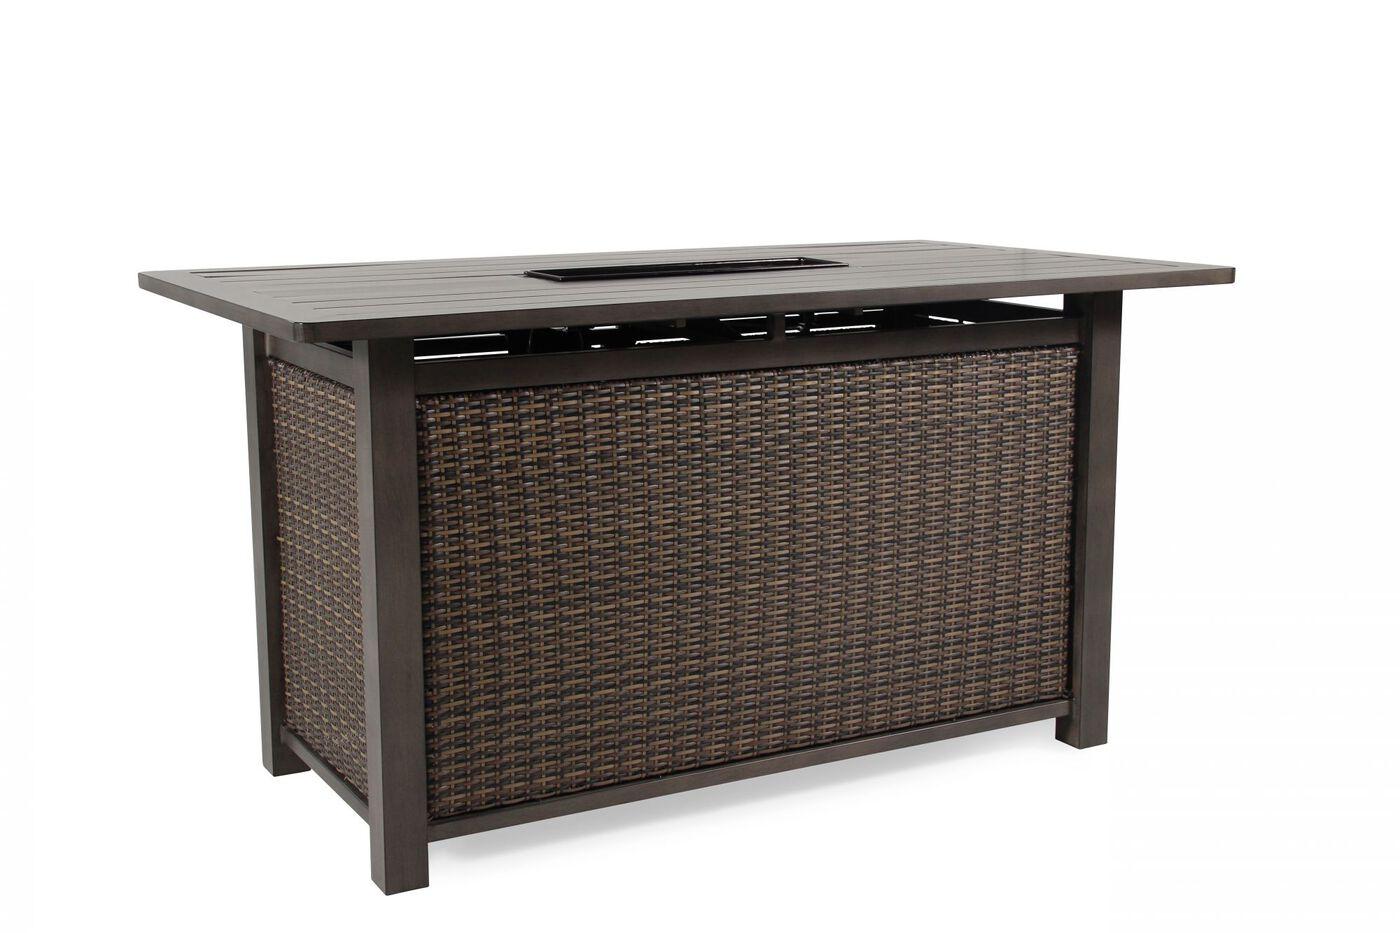 Mathis Brothers Patio Furniture agio davenport bar height fire table | mathis brothers furniture